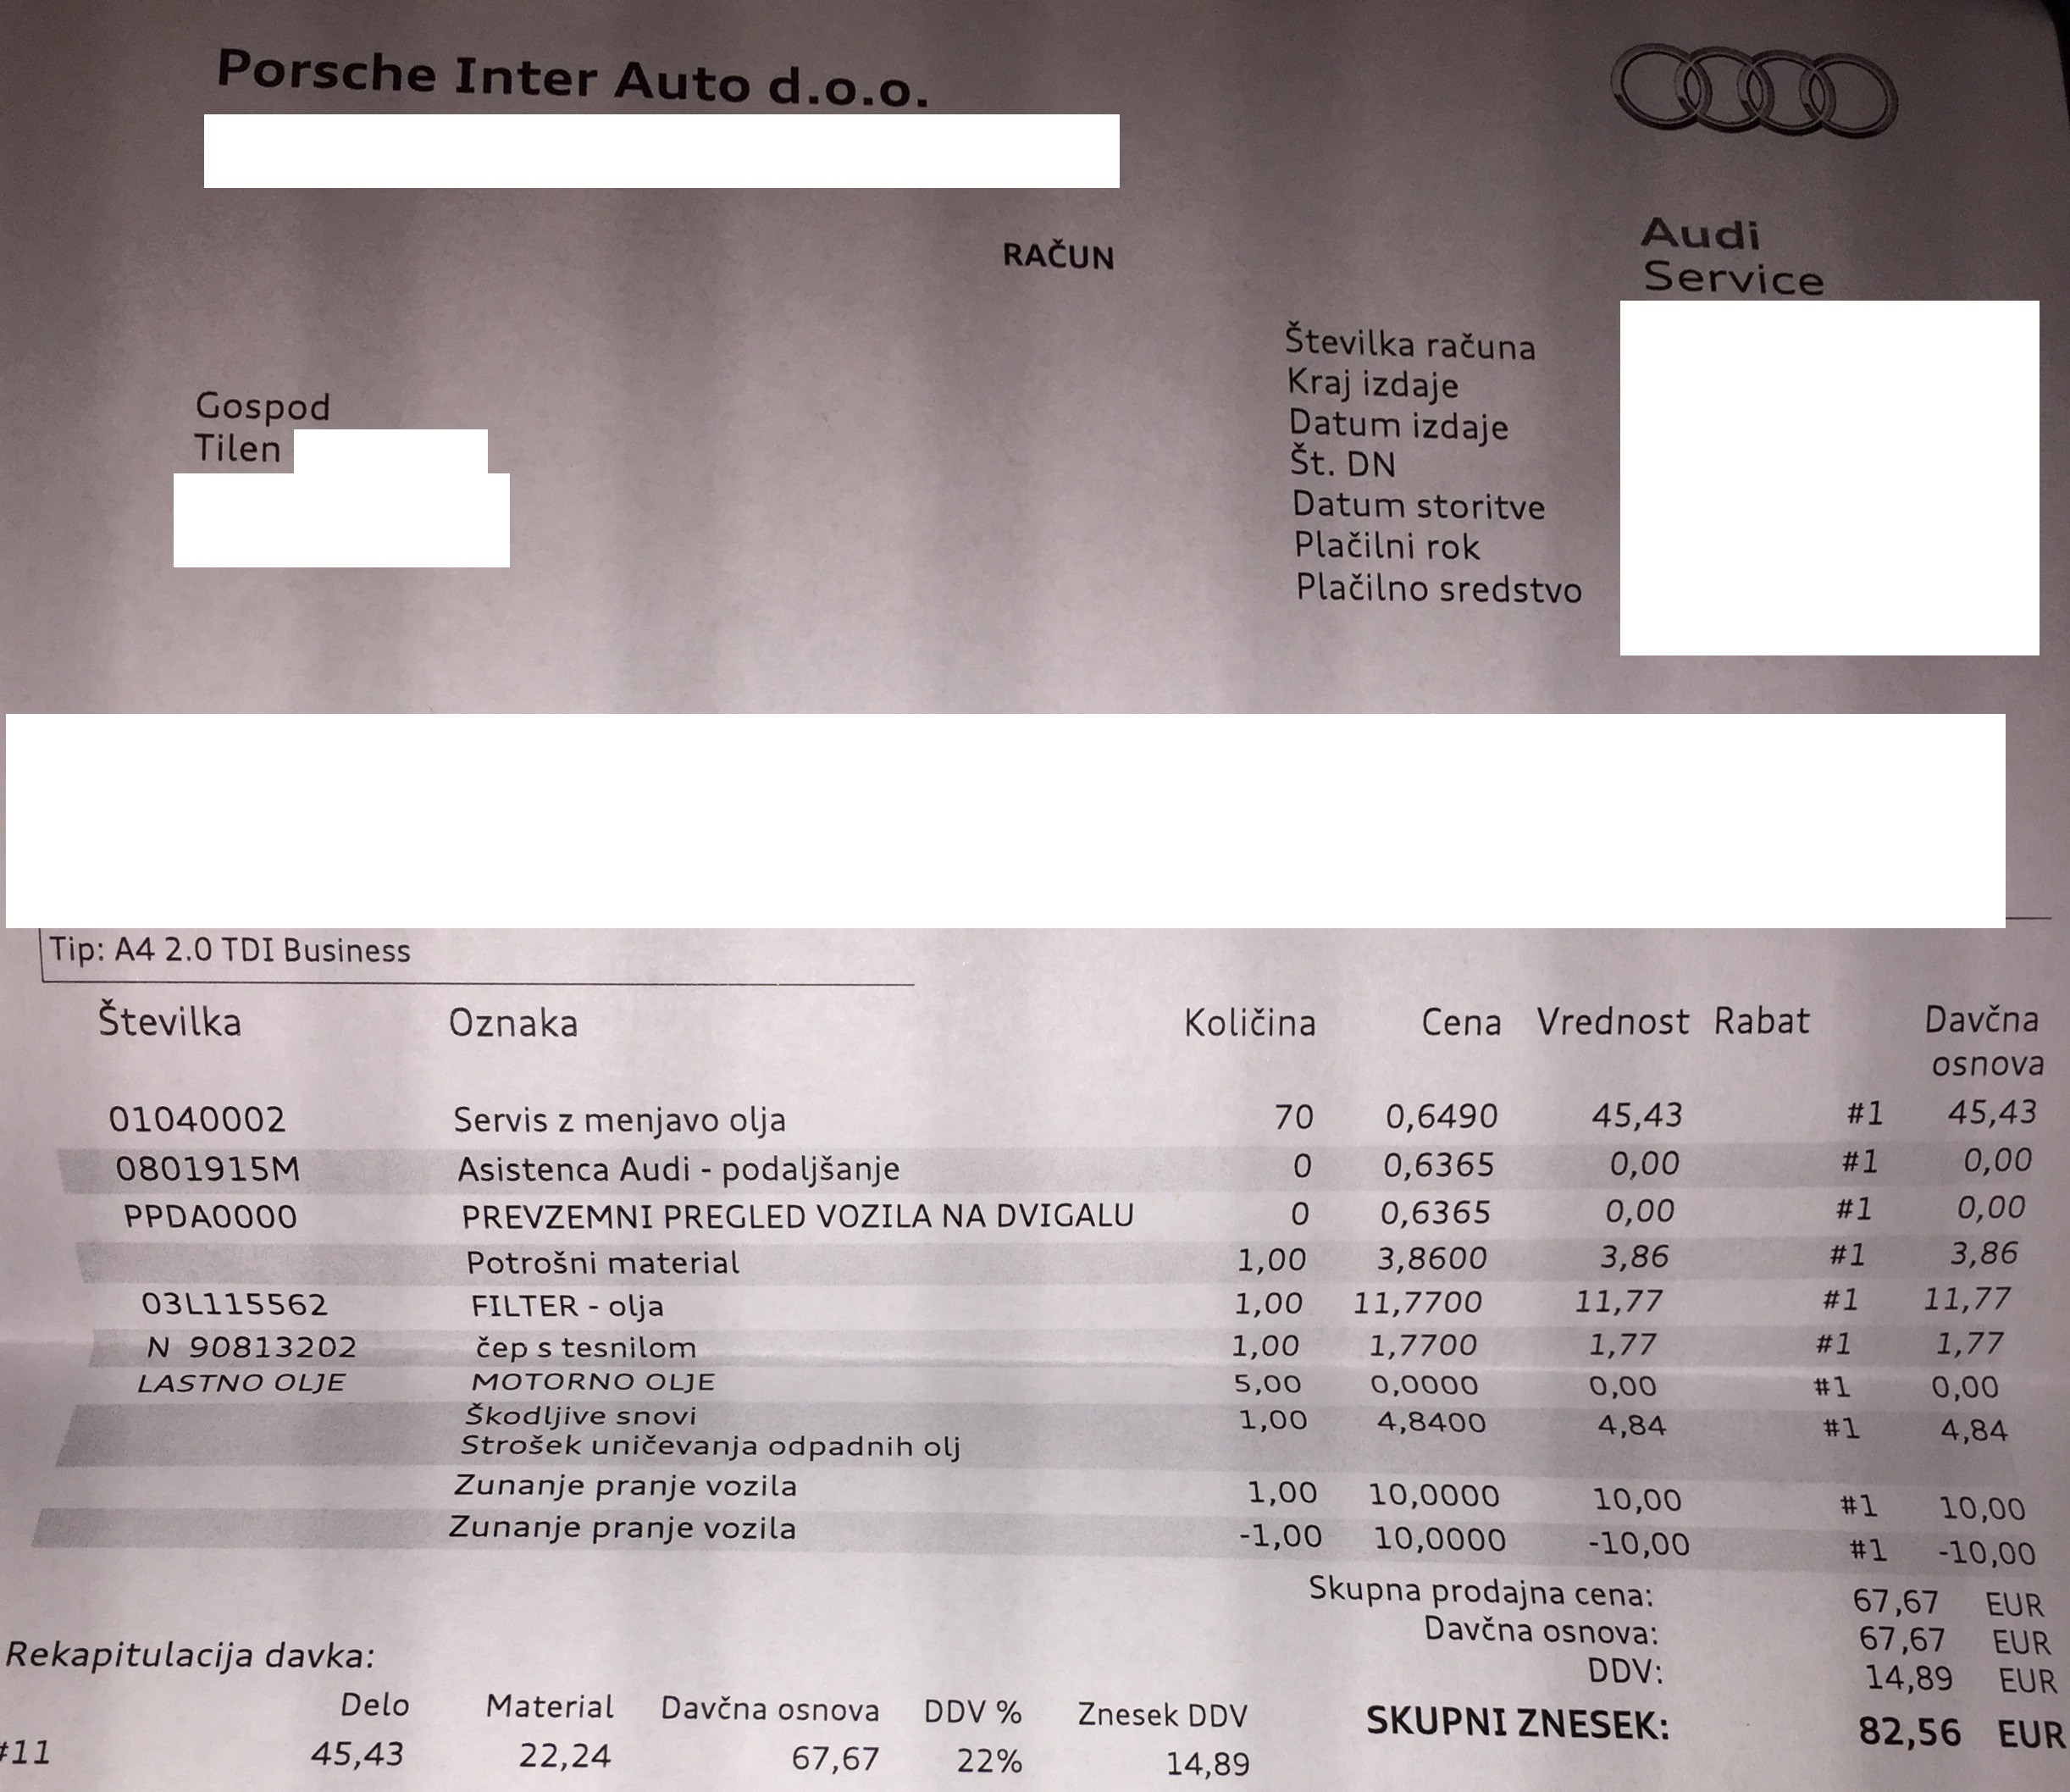 Račun - redni servis 82 EUR